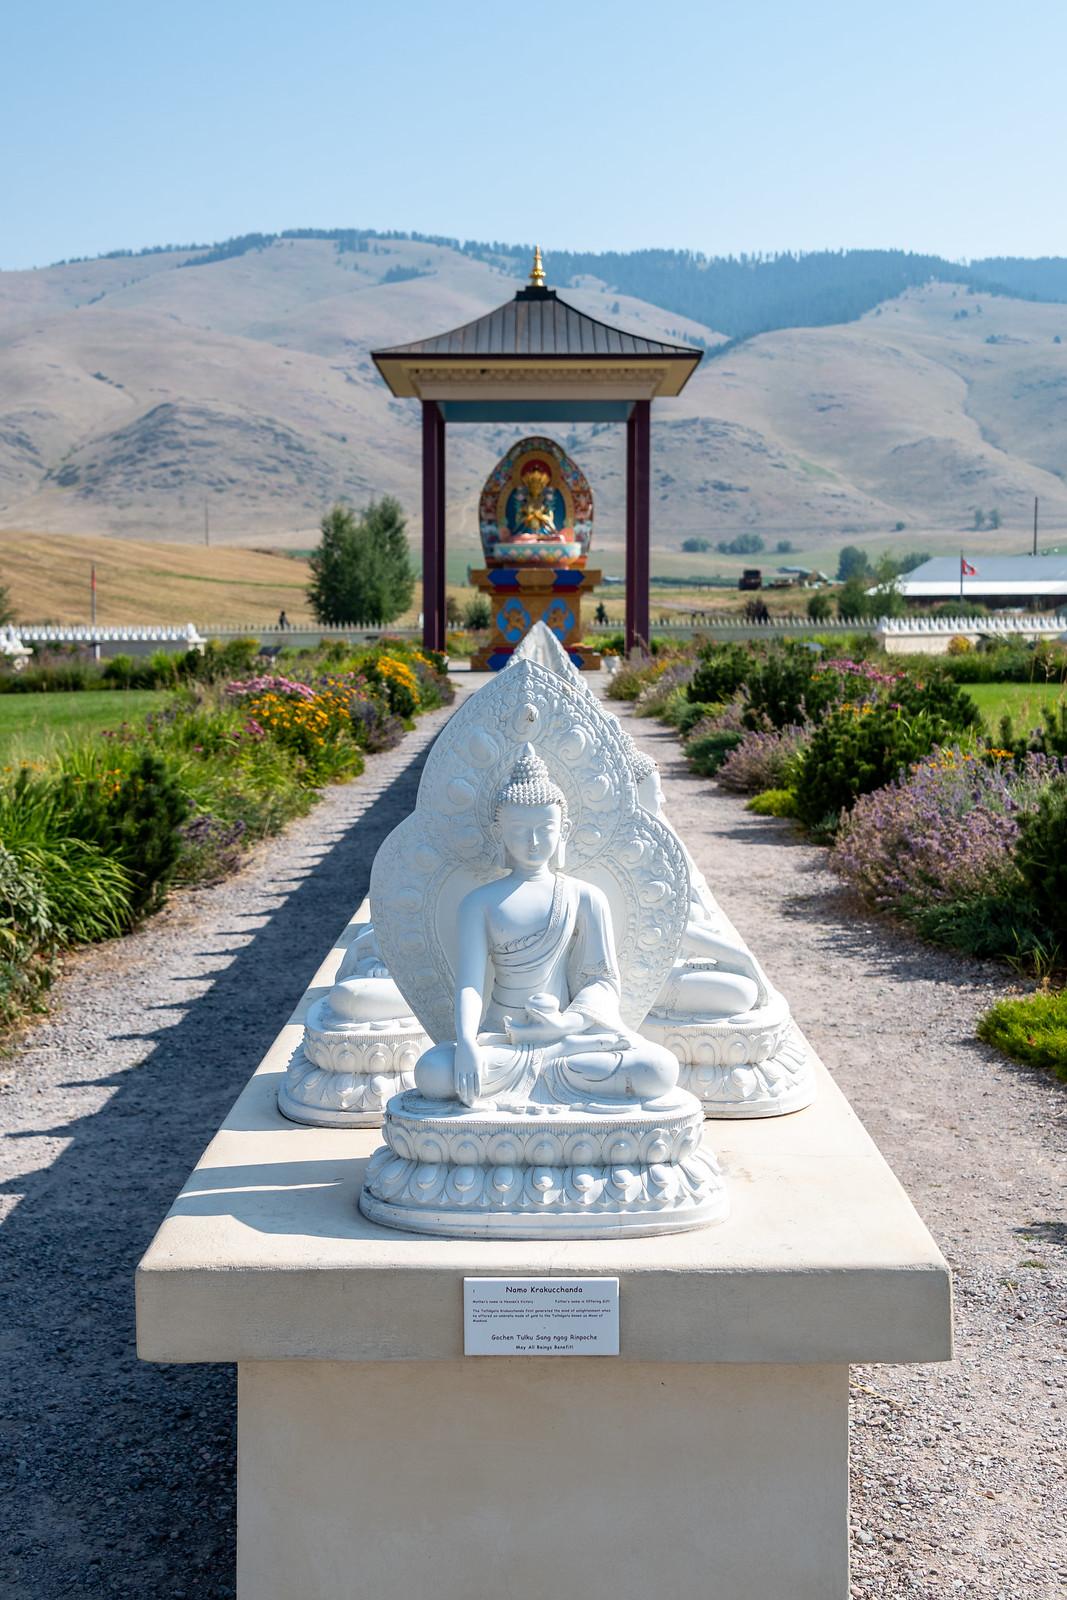 Ewam and Garden of One Thousand Buddhas